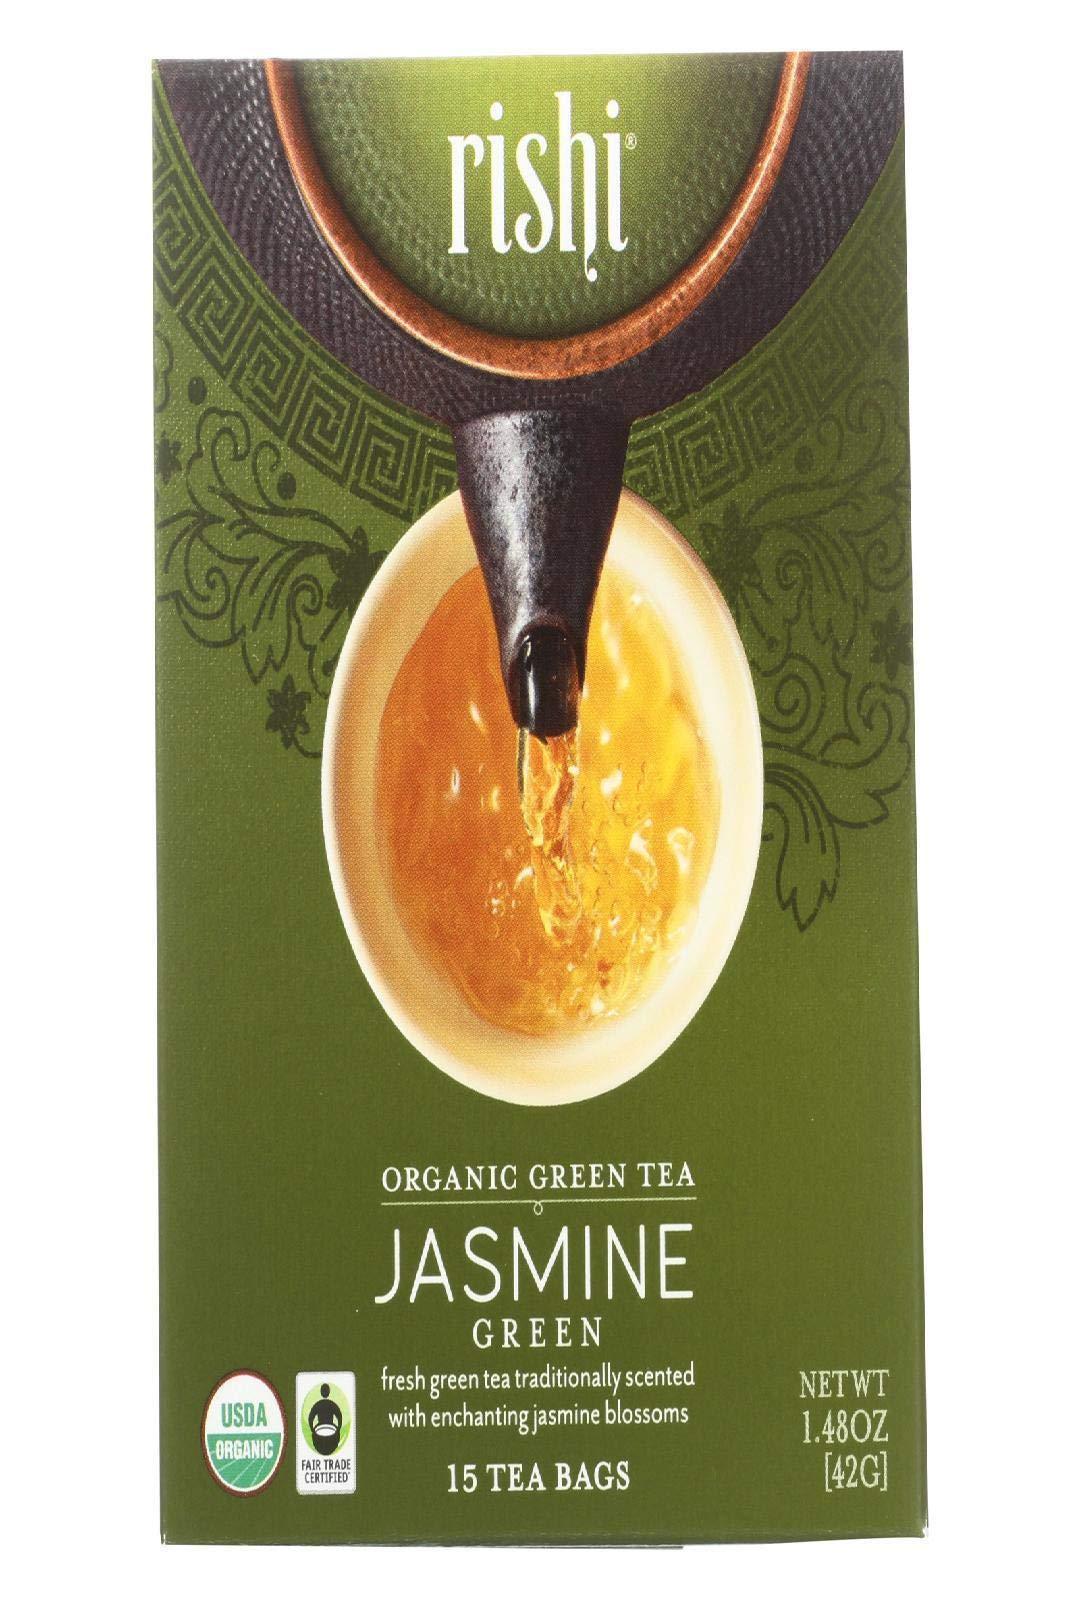 Rishi Jasmine Tea Organic Green Sachets 15 Count Bags